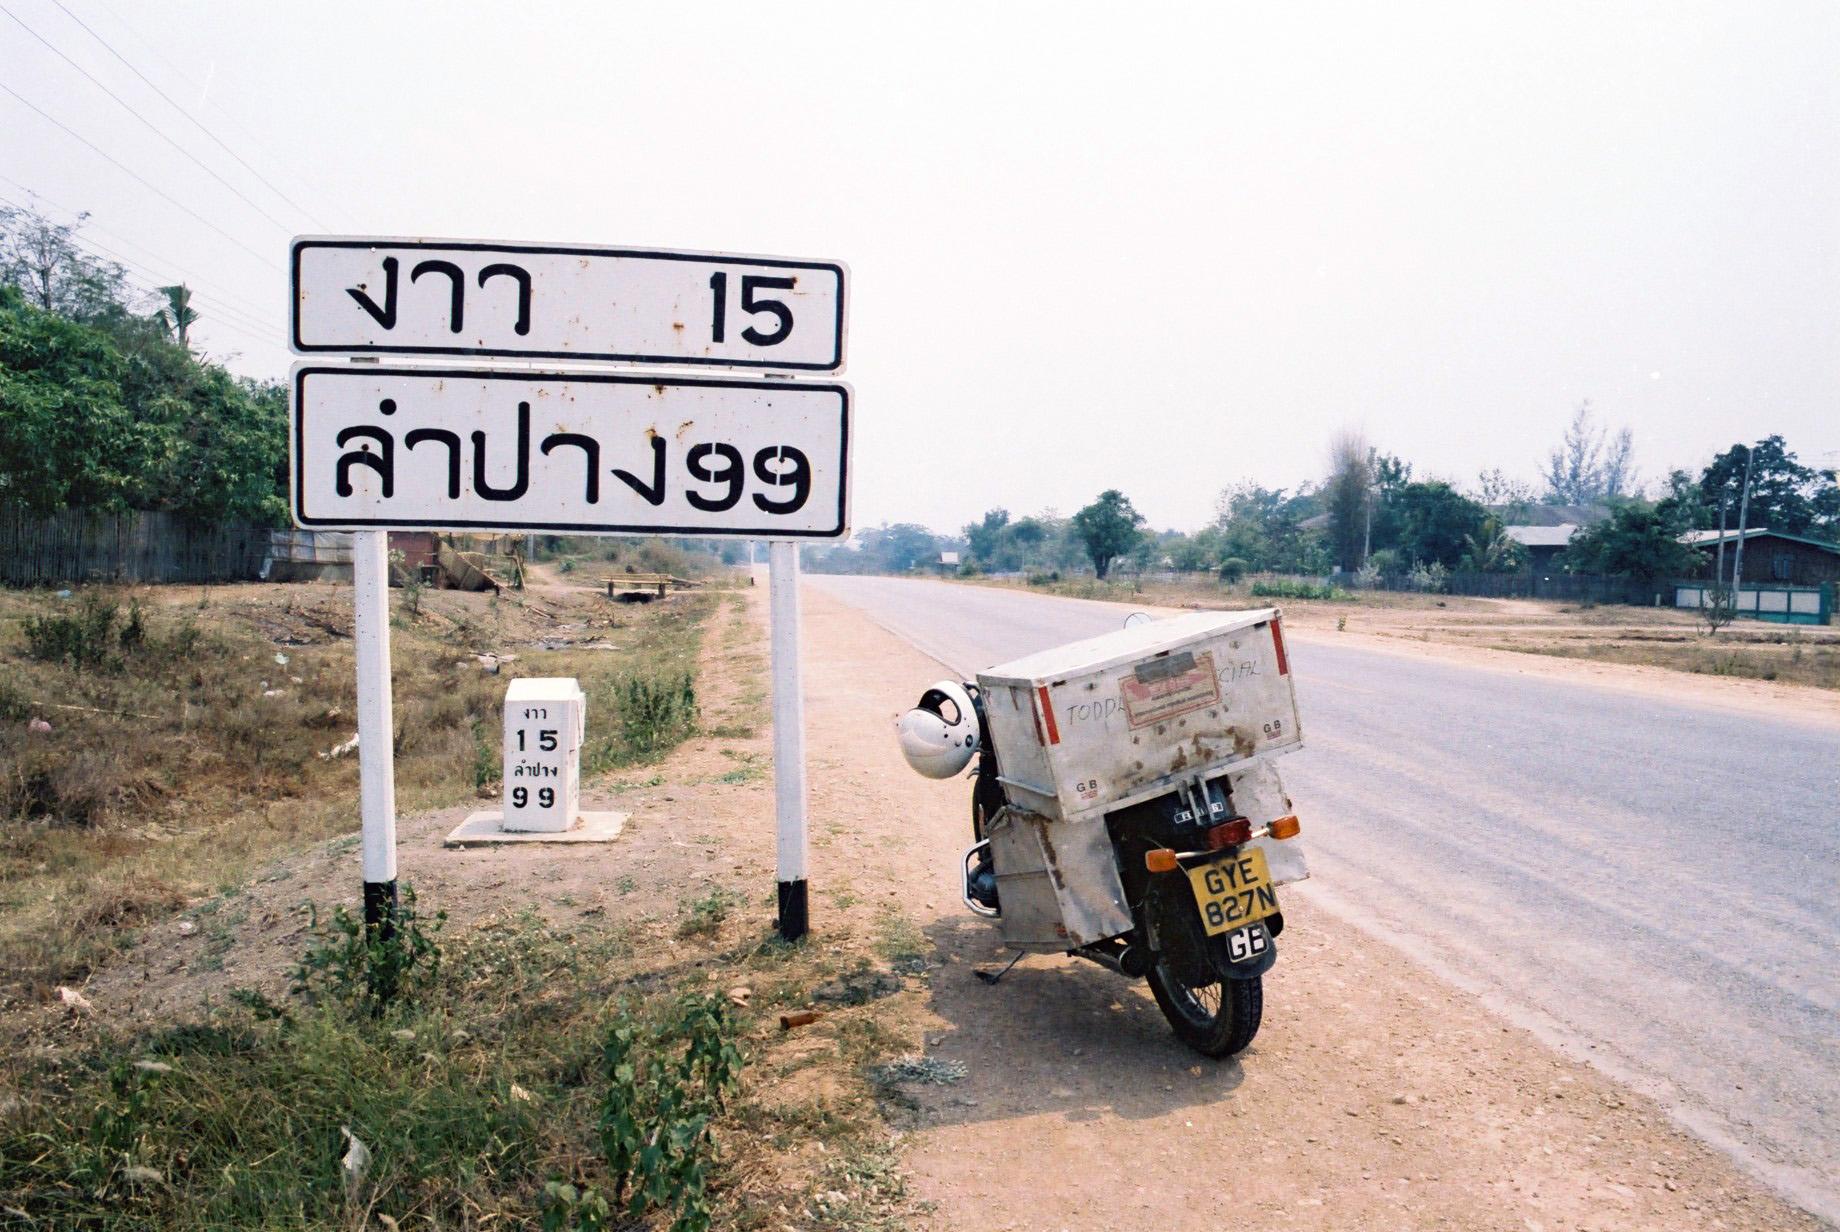 Elspeth Beard - Thailand